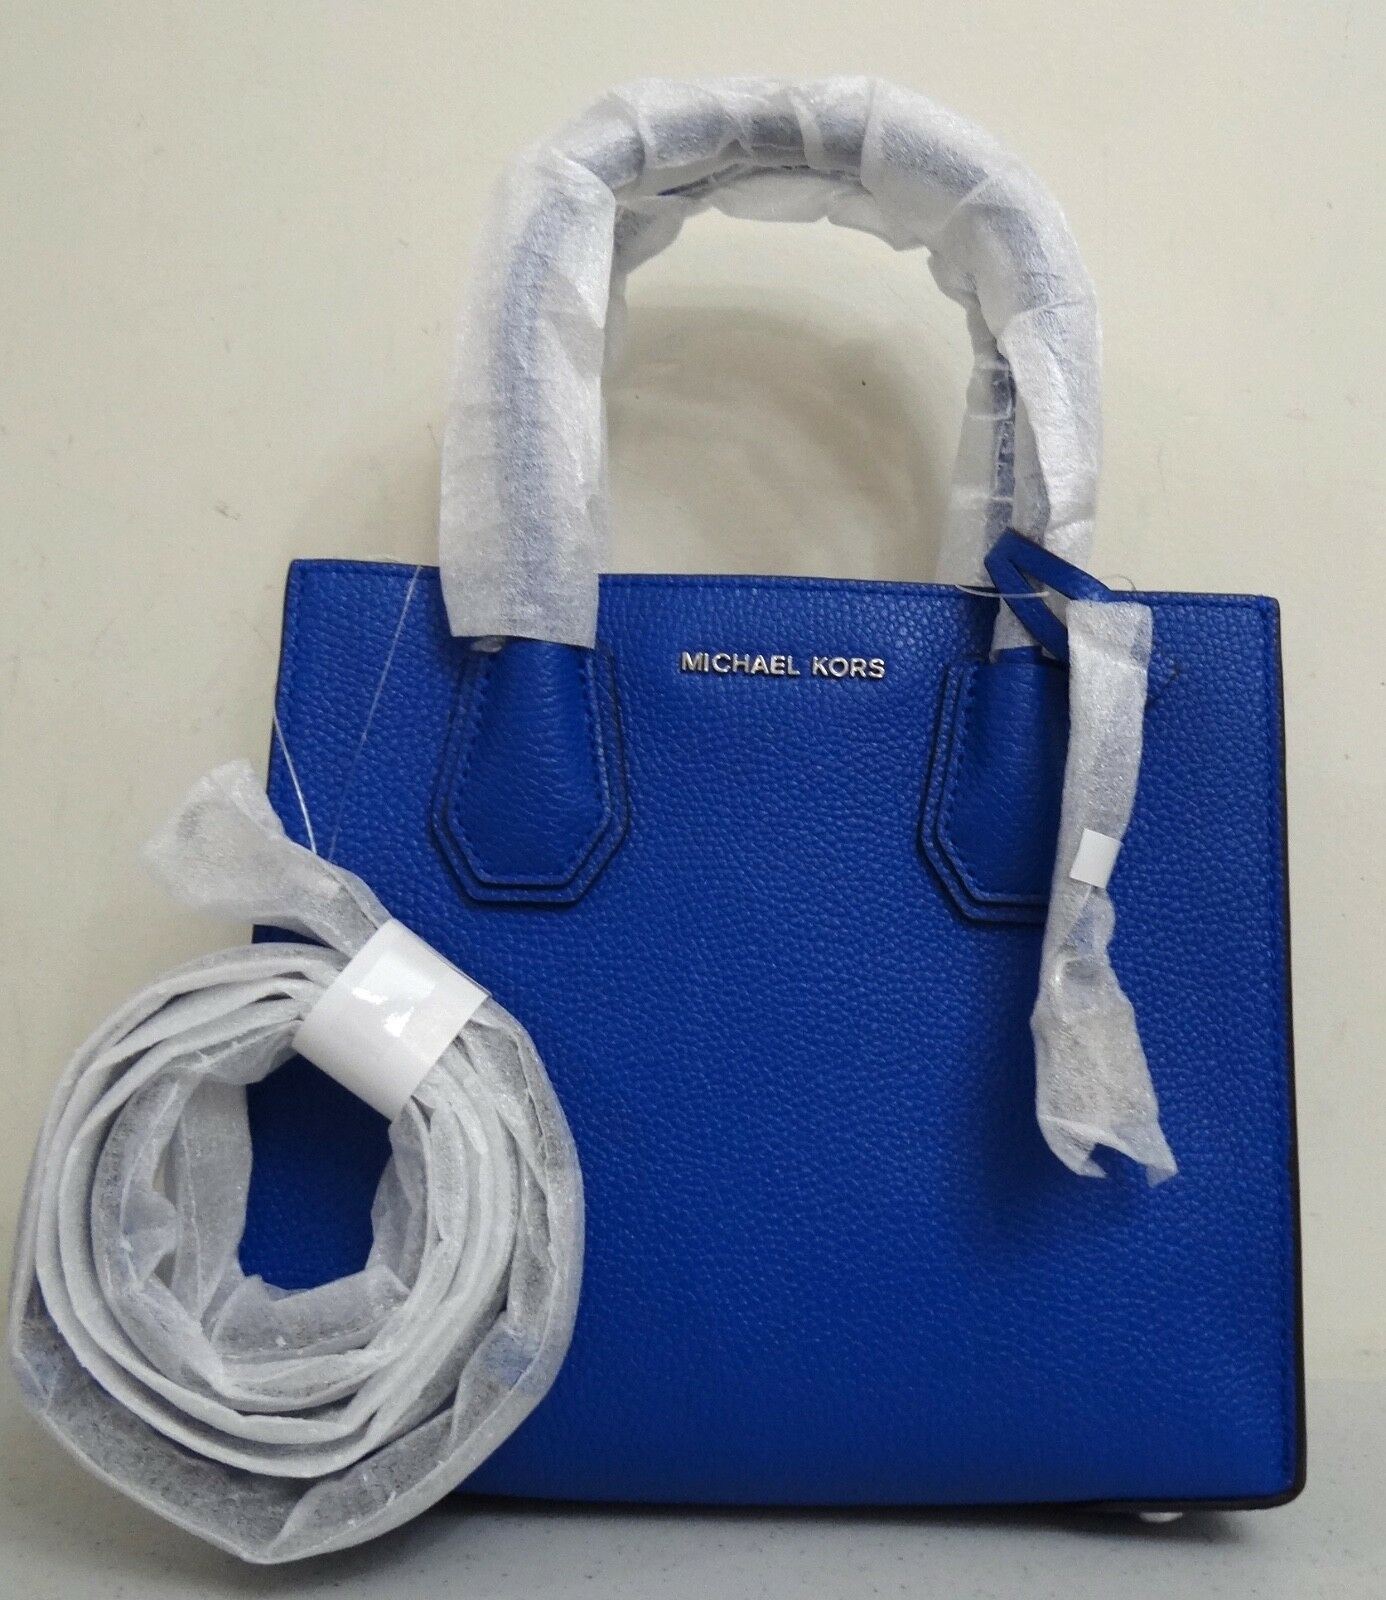 b7e876f23919 Michael Kors Studio Mercer Medium Messenger Electric Blue 30f6sm9m2l for  sale online   eBay